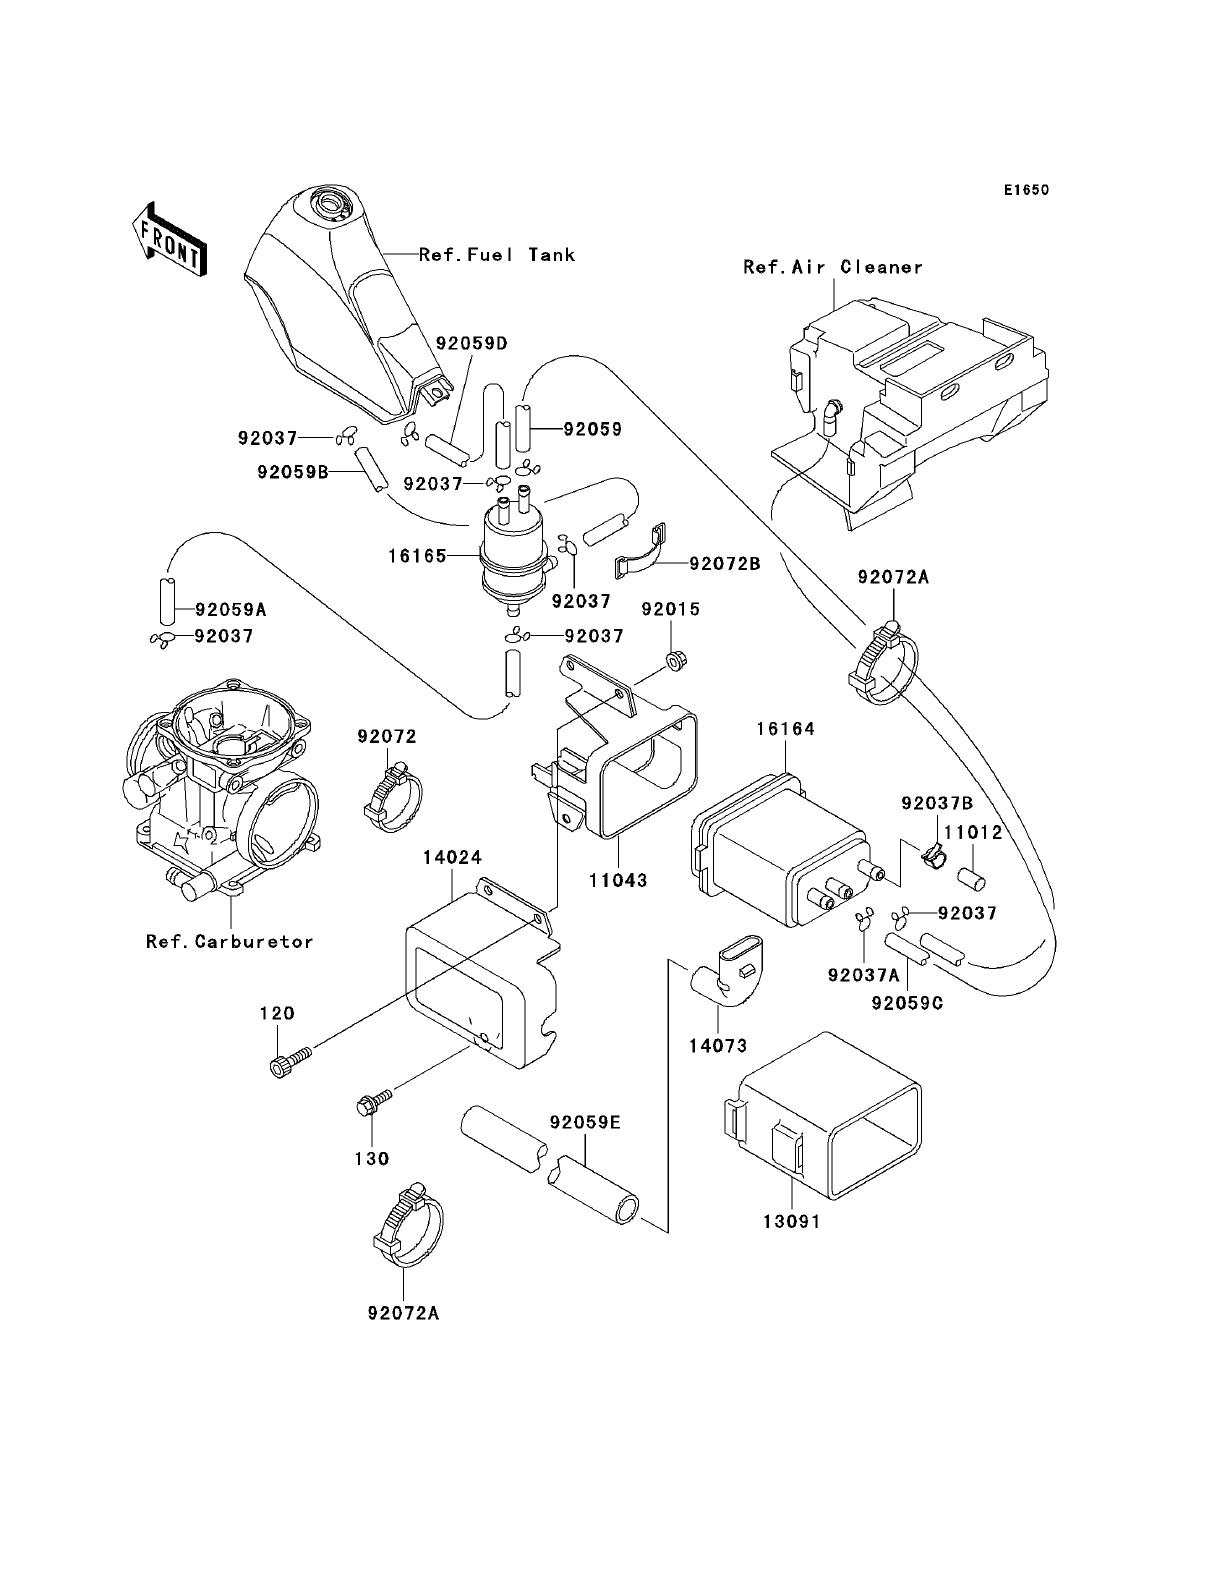 kawasaki bayou 250 carburetor diagram ford 7 pin trailer plug wiring klr carb imageresizertool com